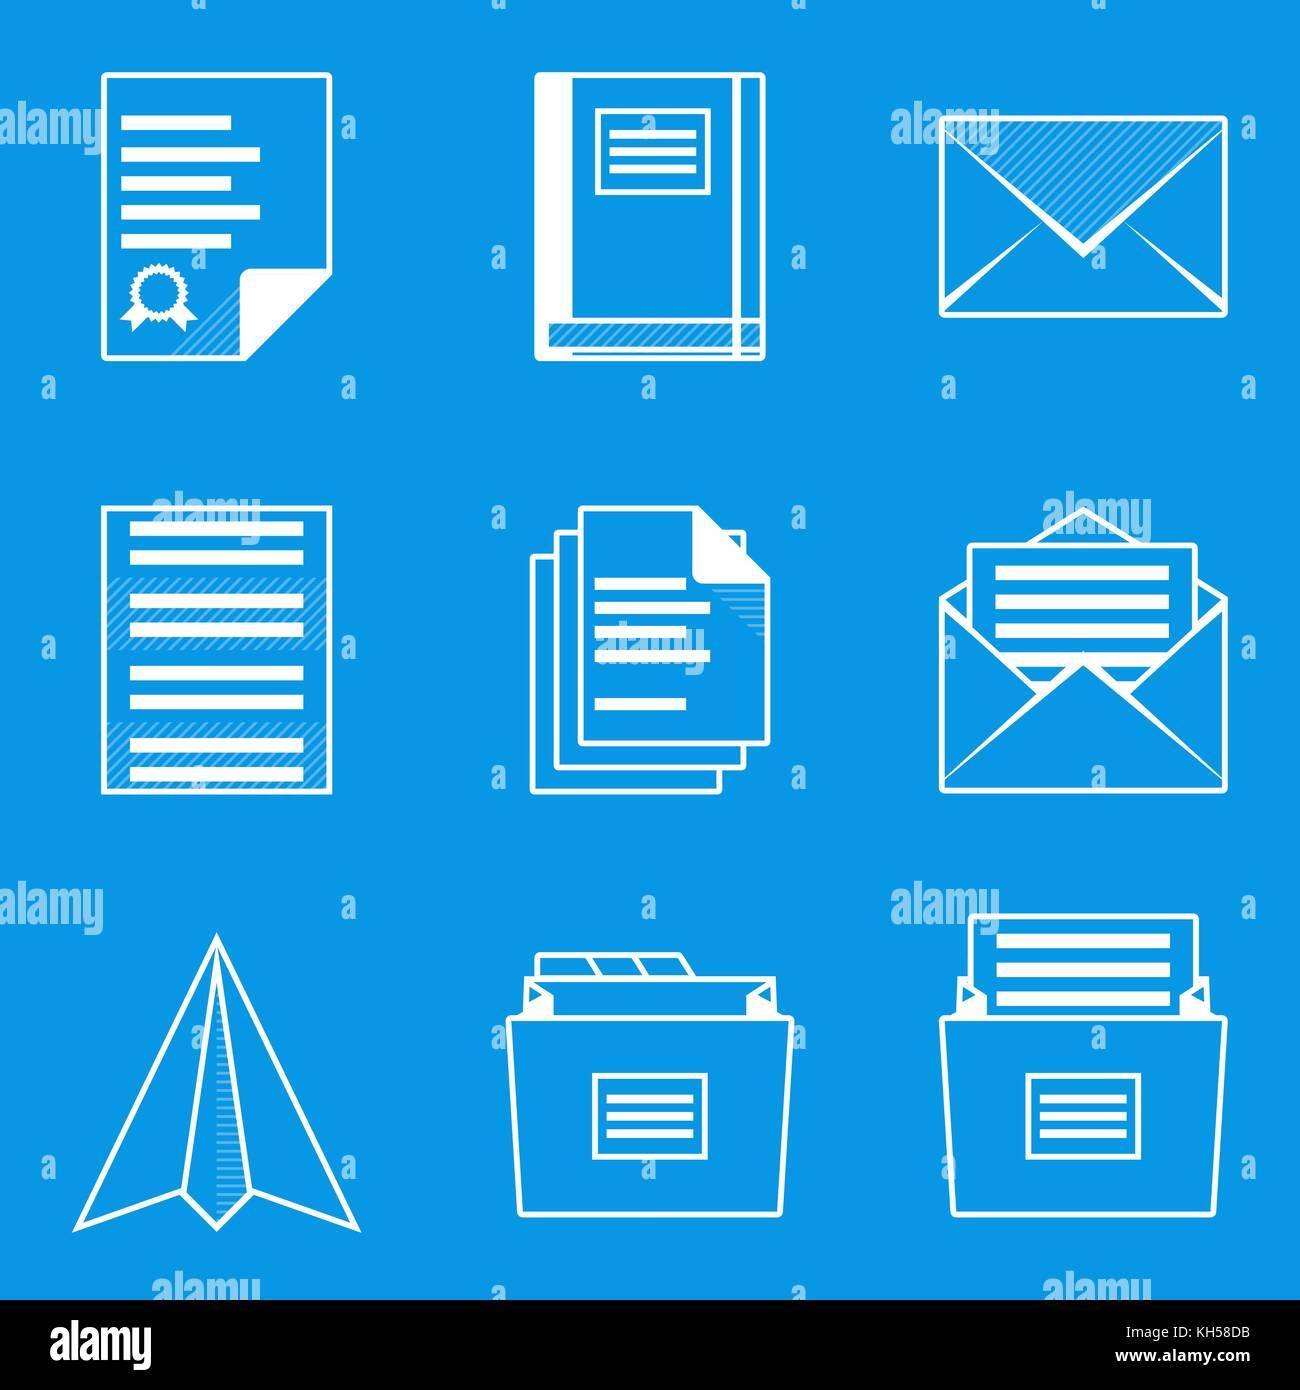 Blueprint icon set paper 2 vector illustration in eps10 stock blueprint icon set paper 2 vector illustration in eps10 malvernweather Choice Image